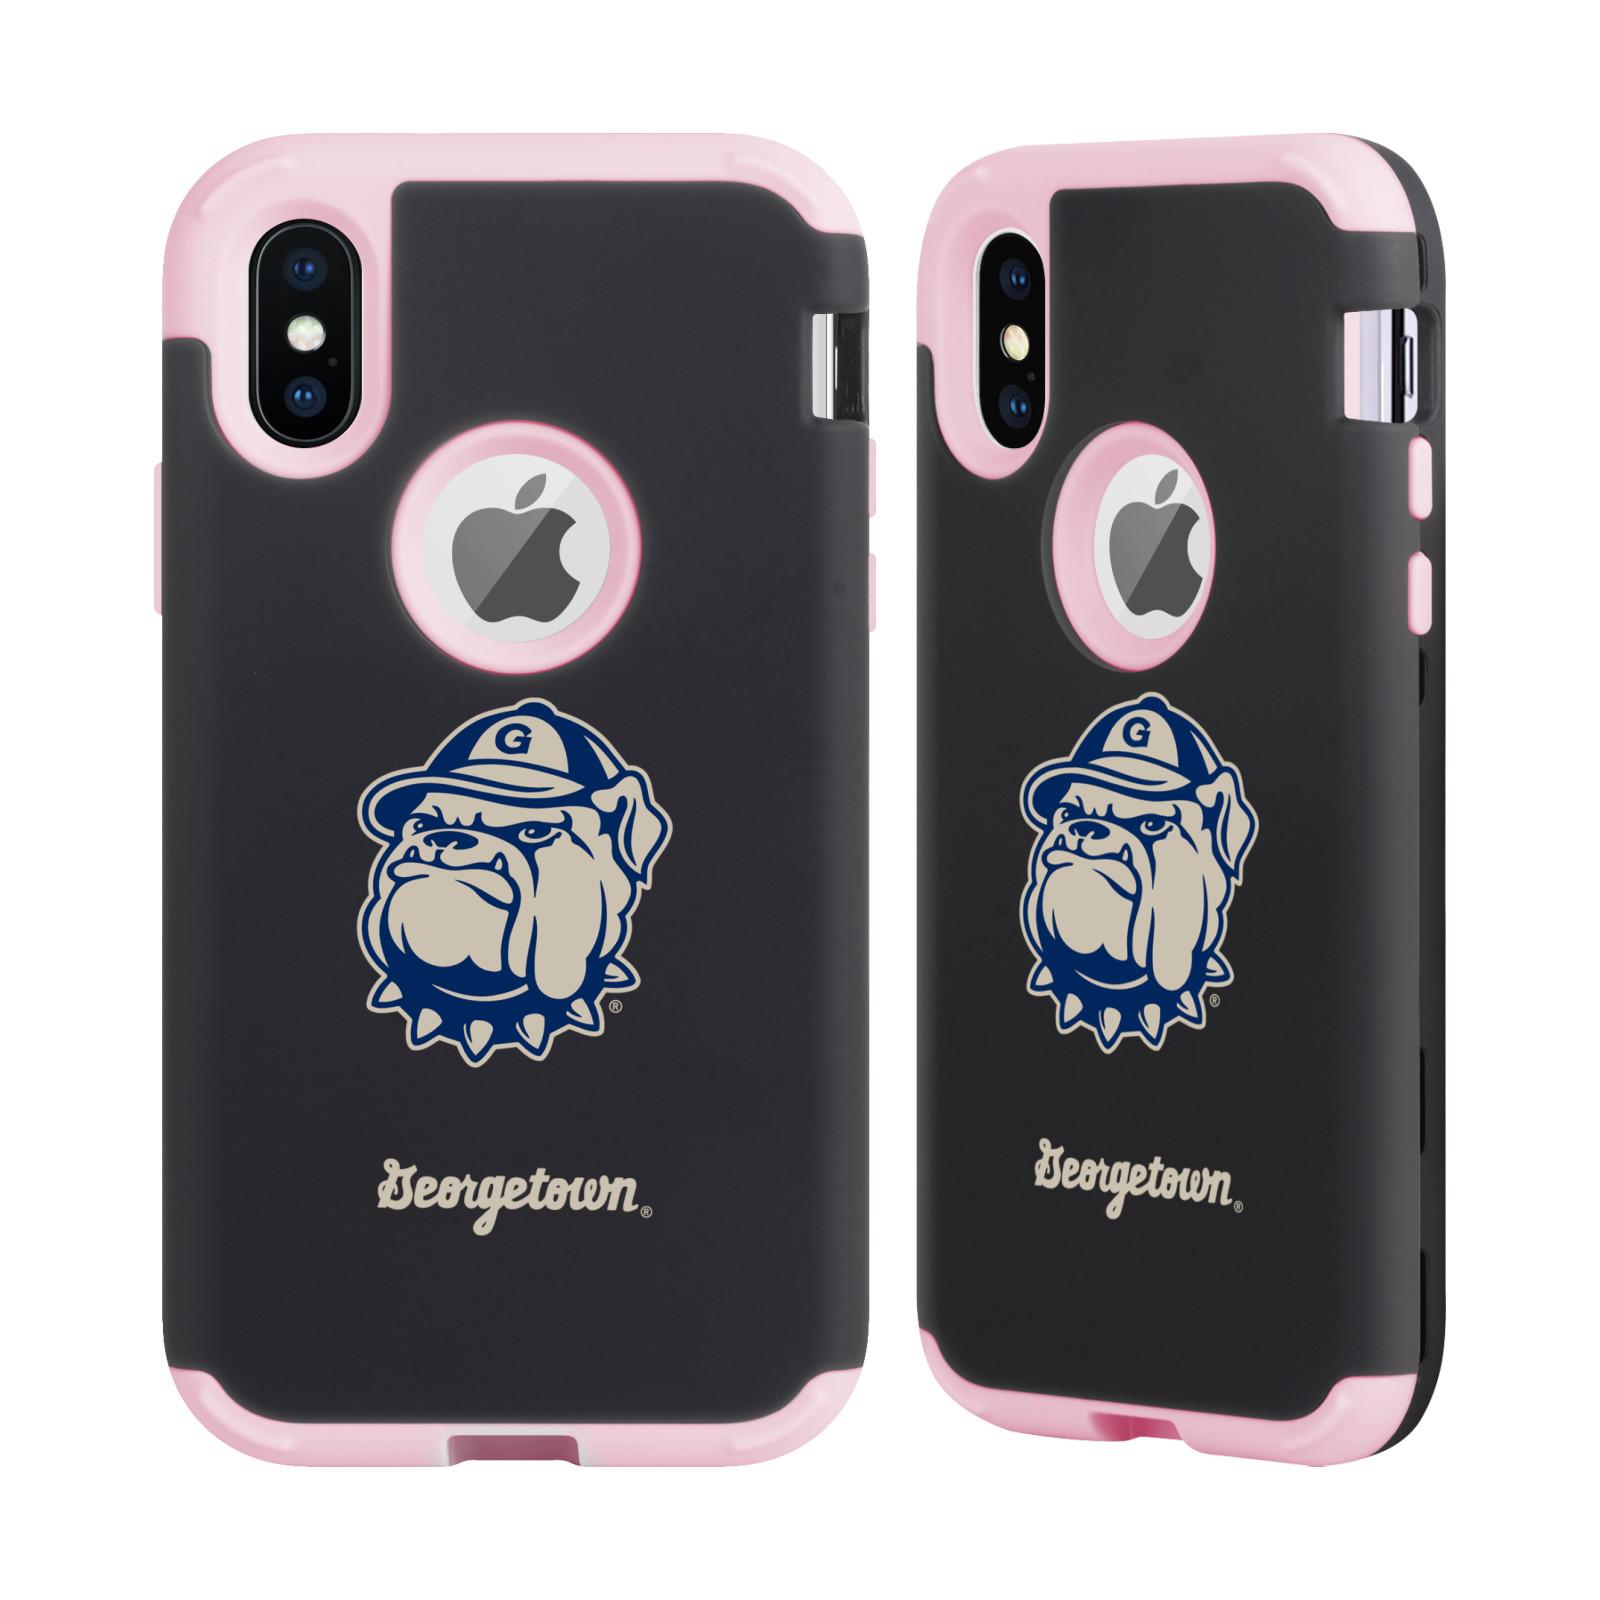 GEORGETOWN-UNIVERSITY-2-LIGHT-PINK-SENTRY-CASE-FOR-APPLE-iPHONE-SAMSUNG-PHONES